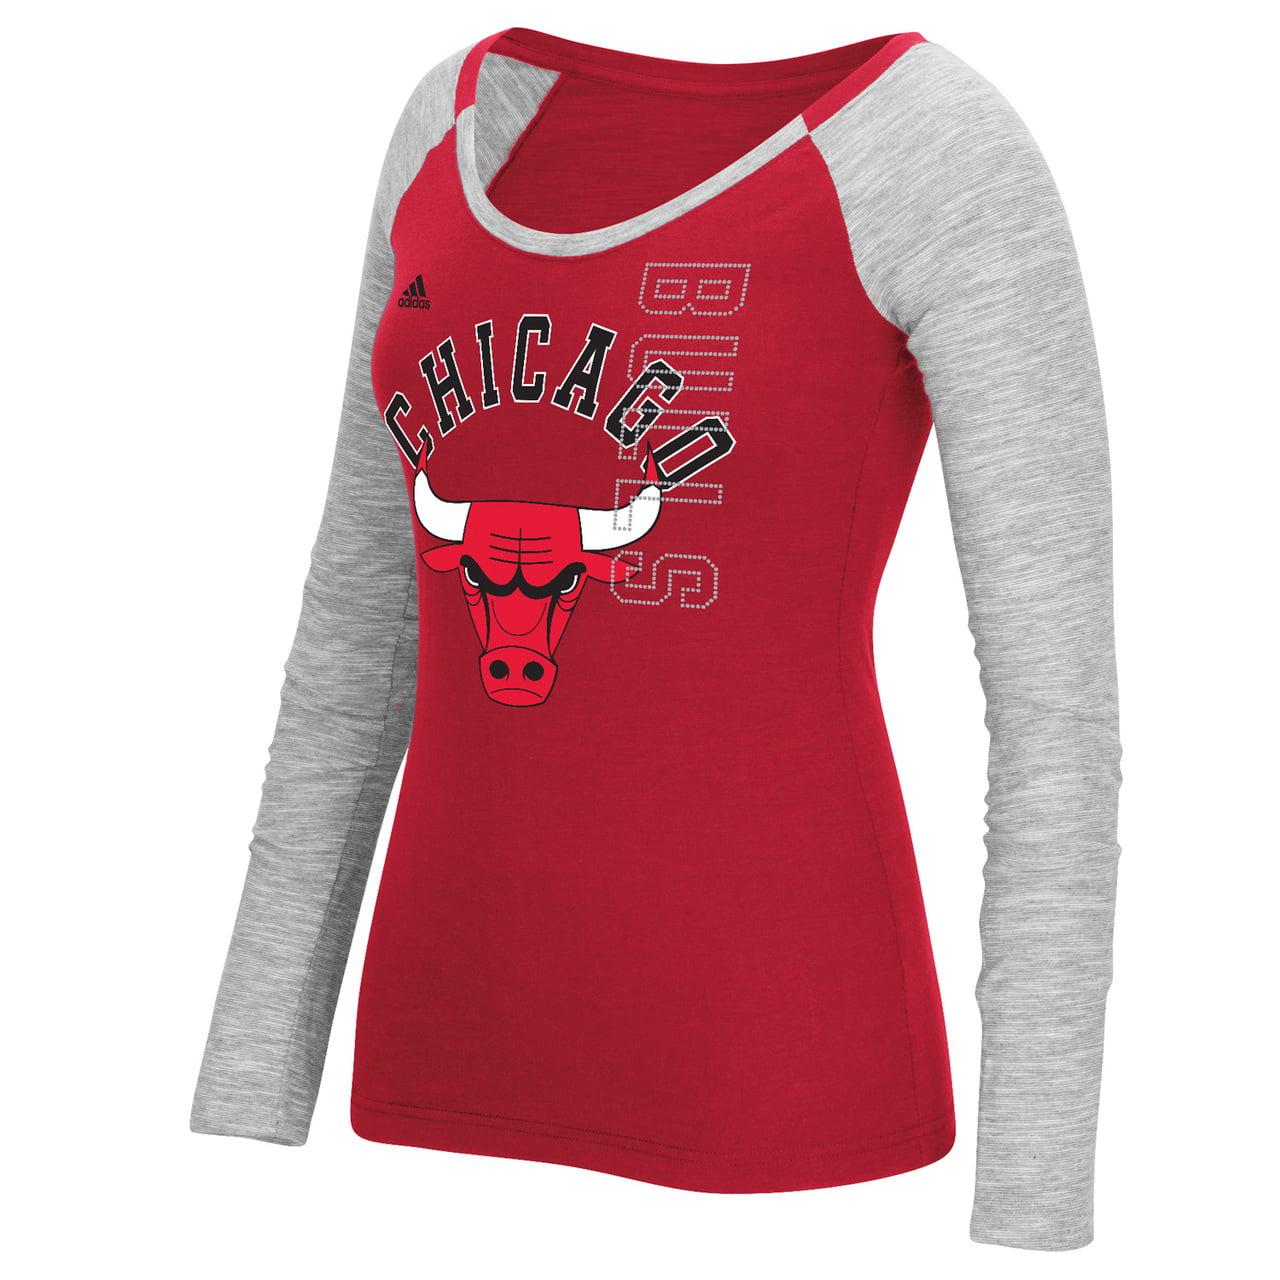 Chicago Bulls Women's Liquid Dots Long Sleeve T-Shirt Red by Adidas